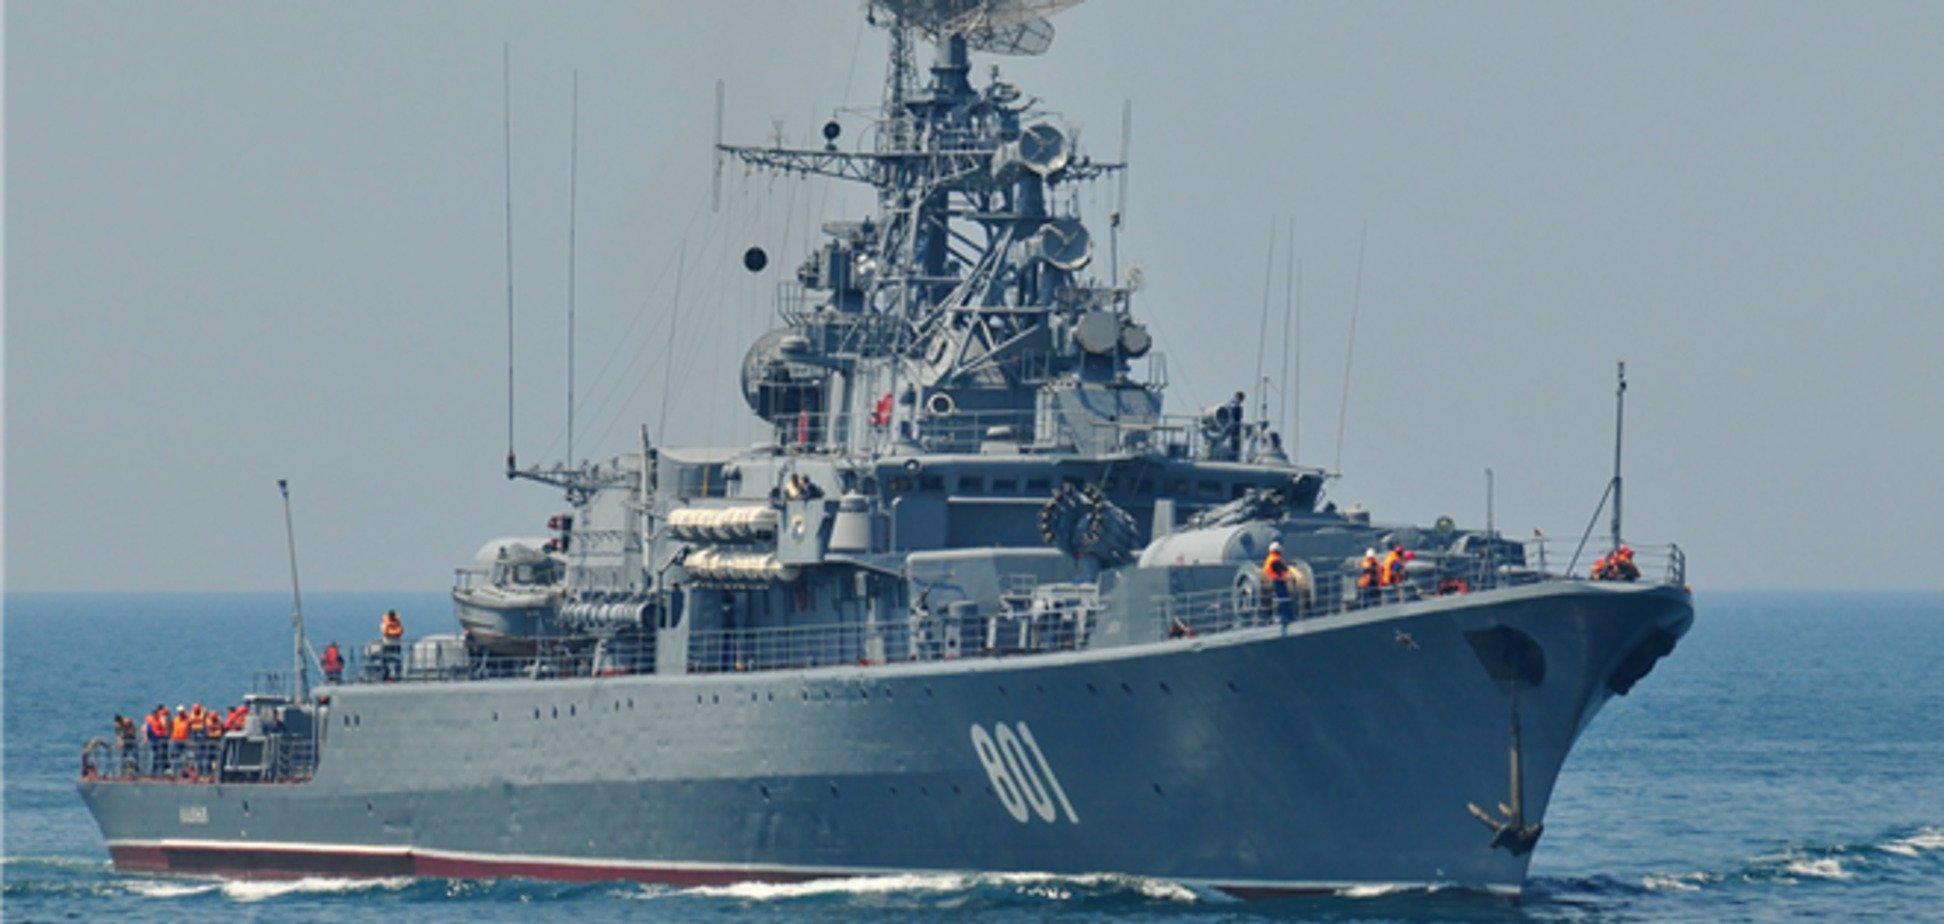 В Севастополе банда сливала дизтопливо с судов и продавала маршрутчикам